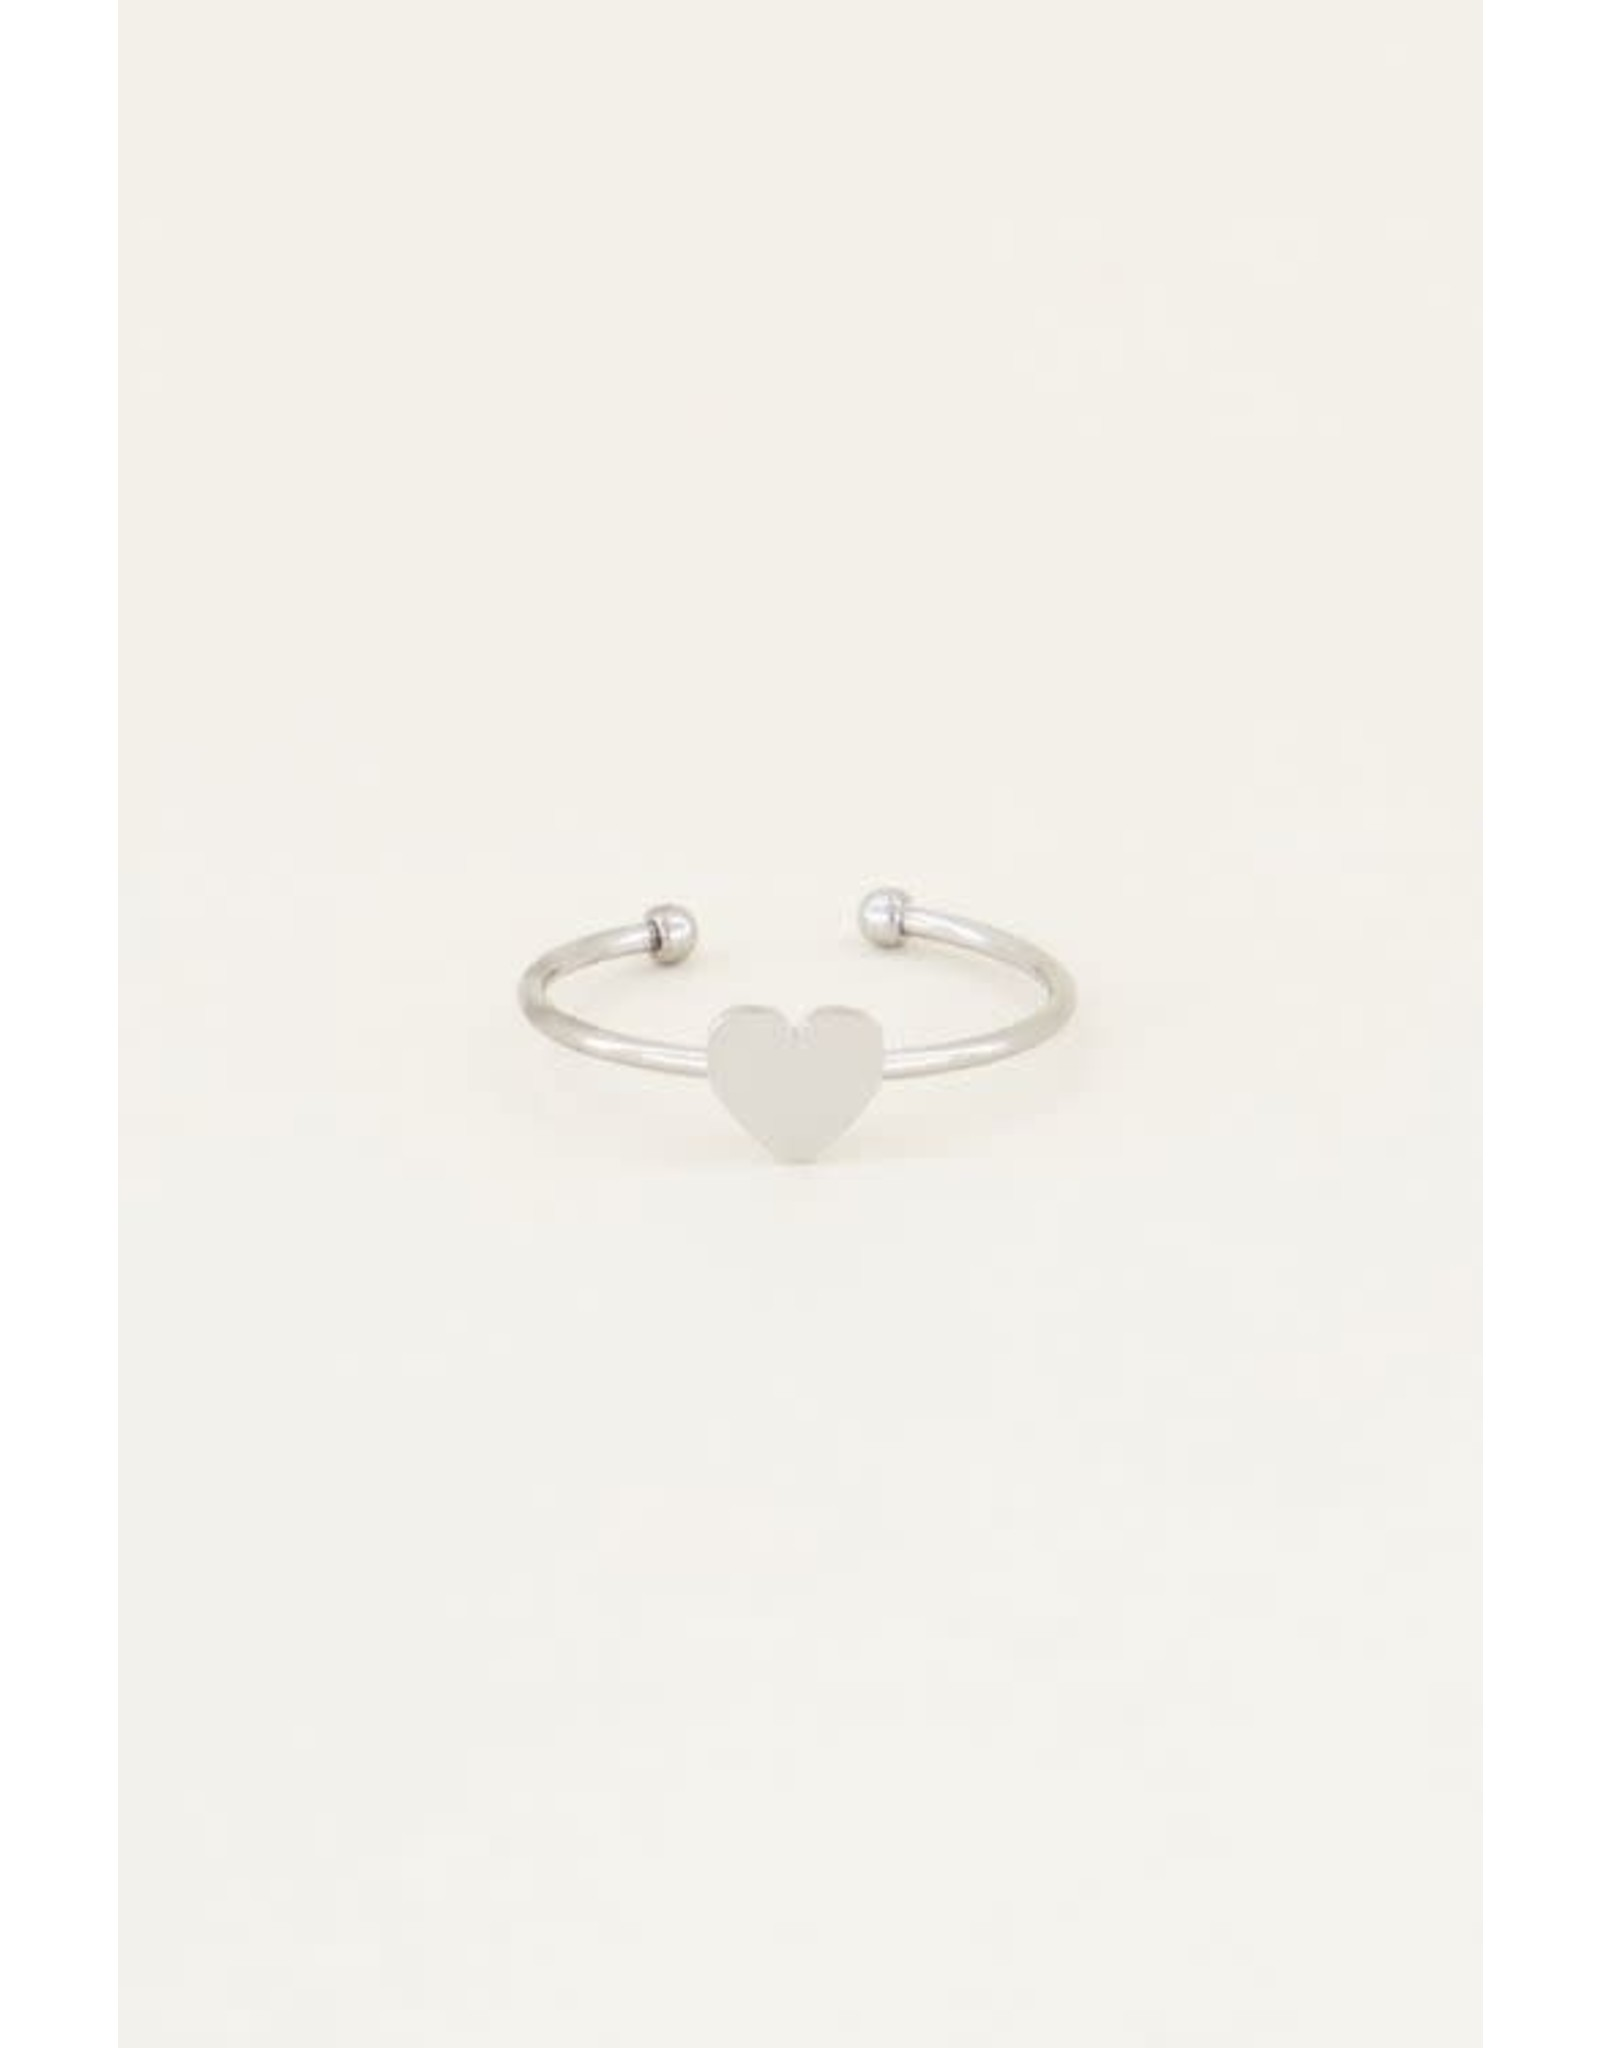 My Jewellery My Jewellery hartje ring